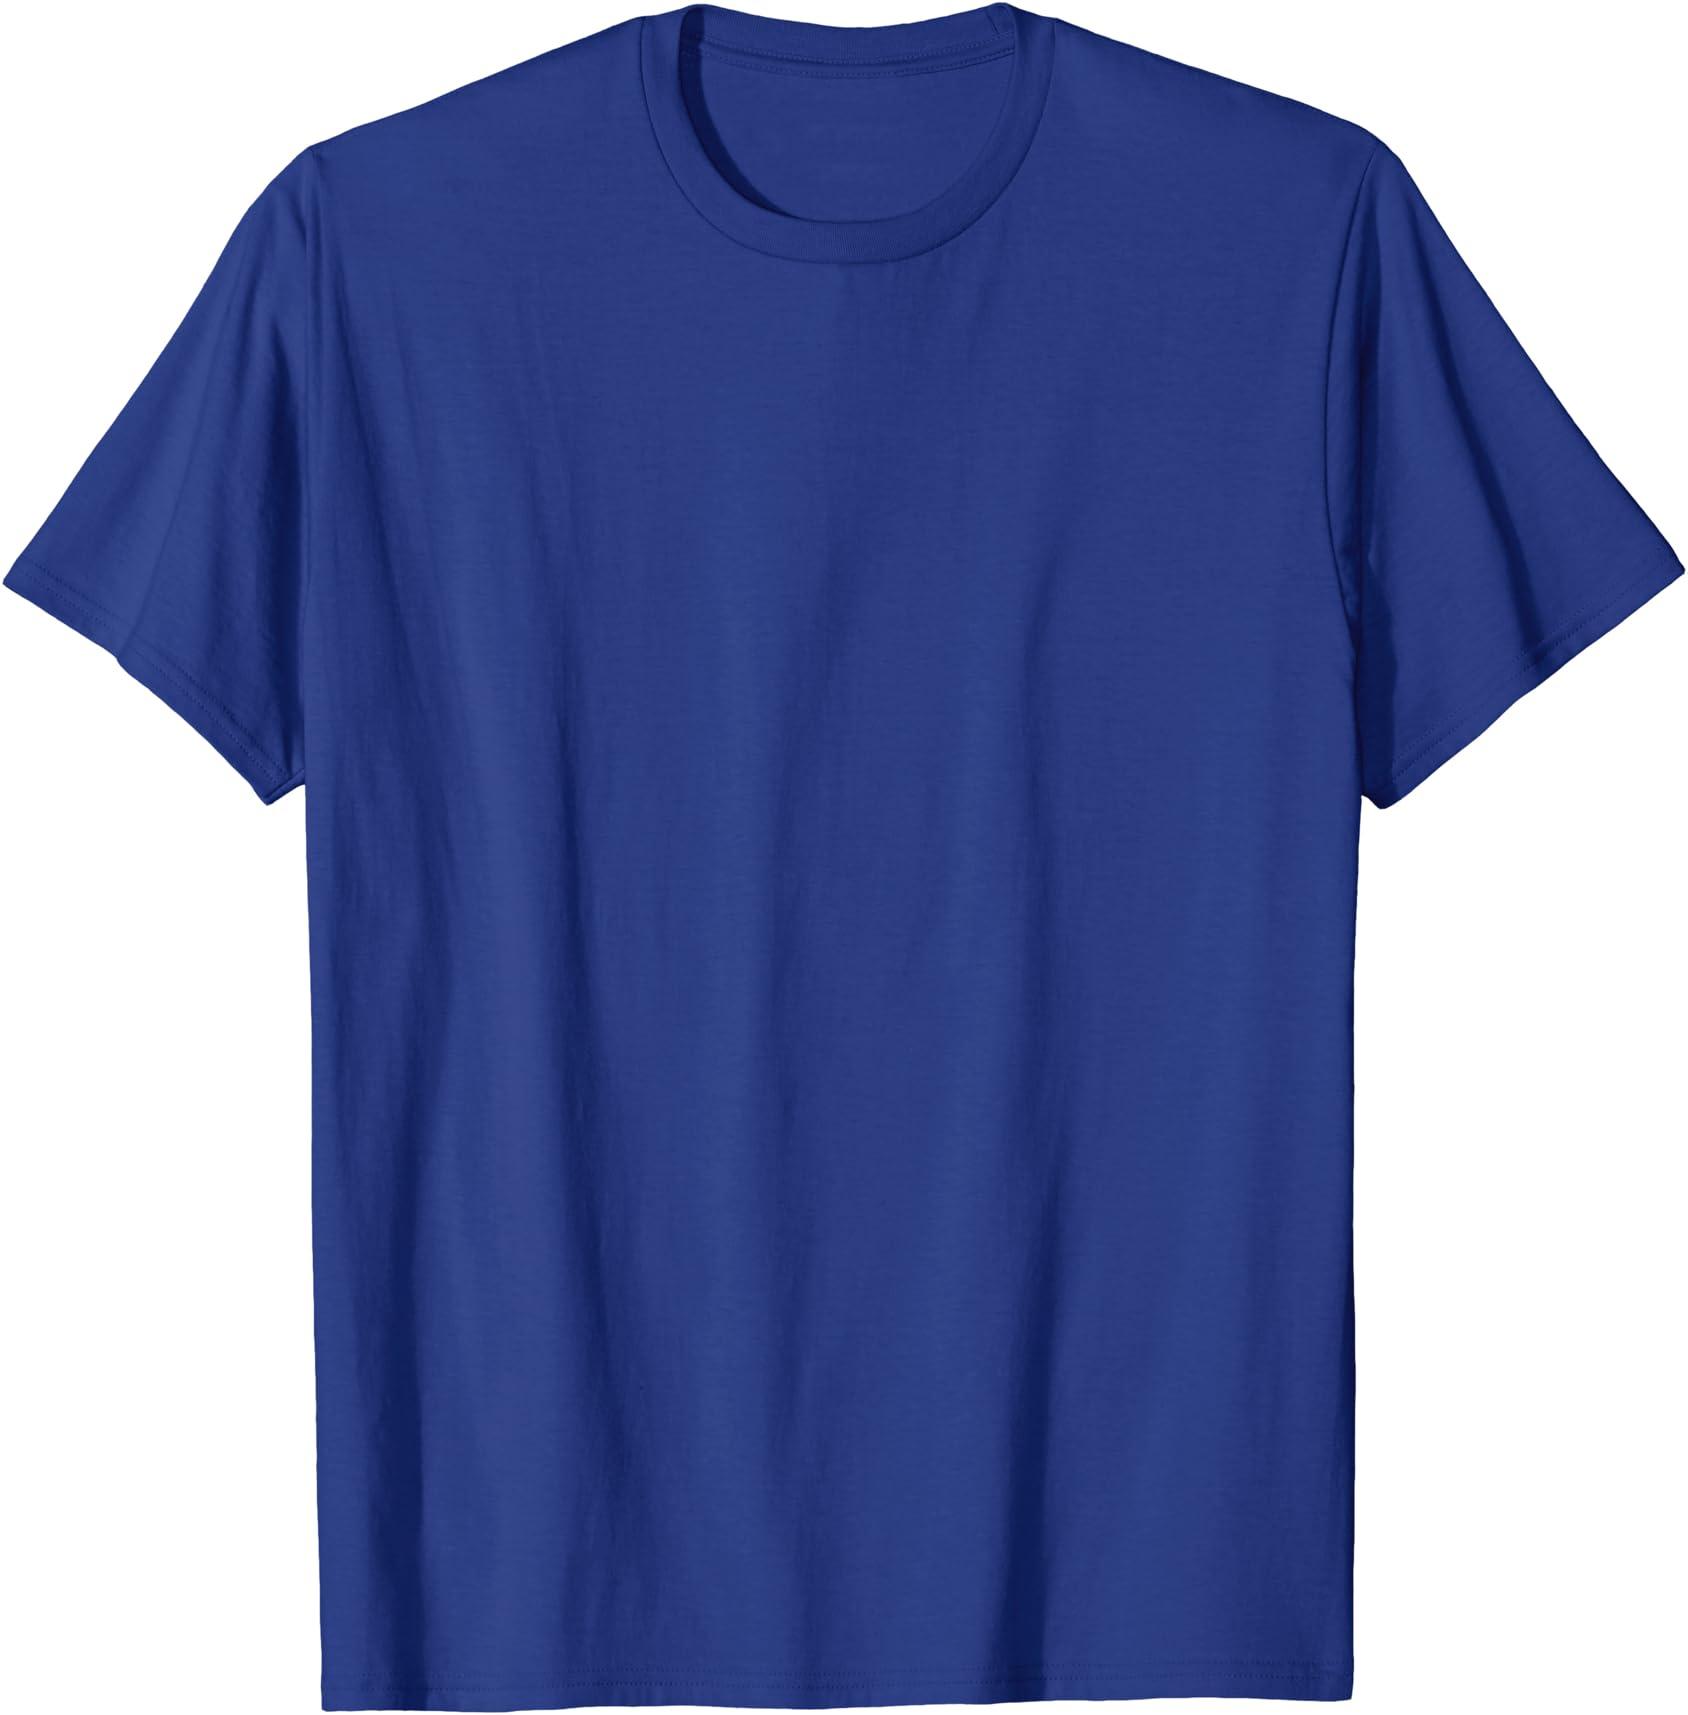 C and D Short Sleeve T Shirt Human League White XL RRP30